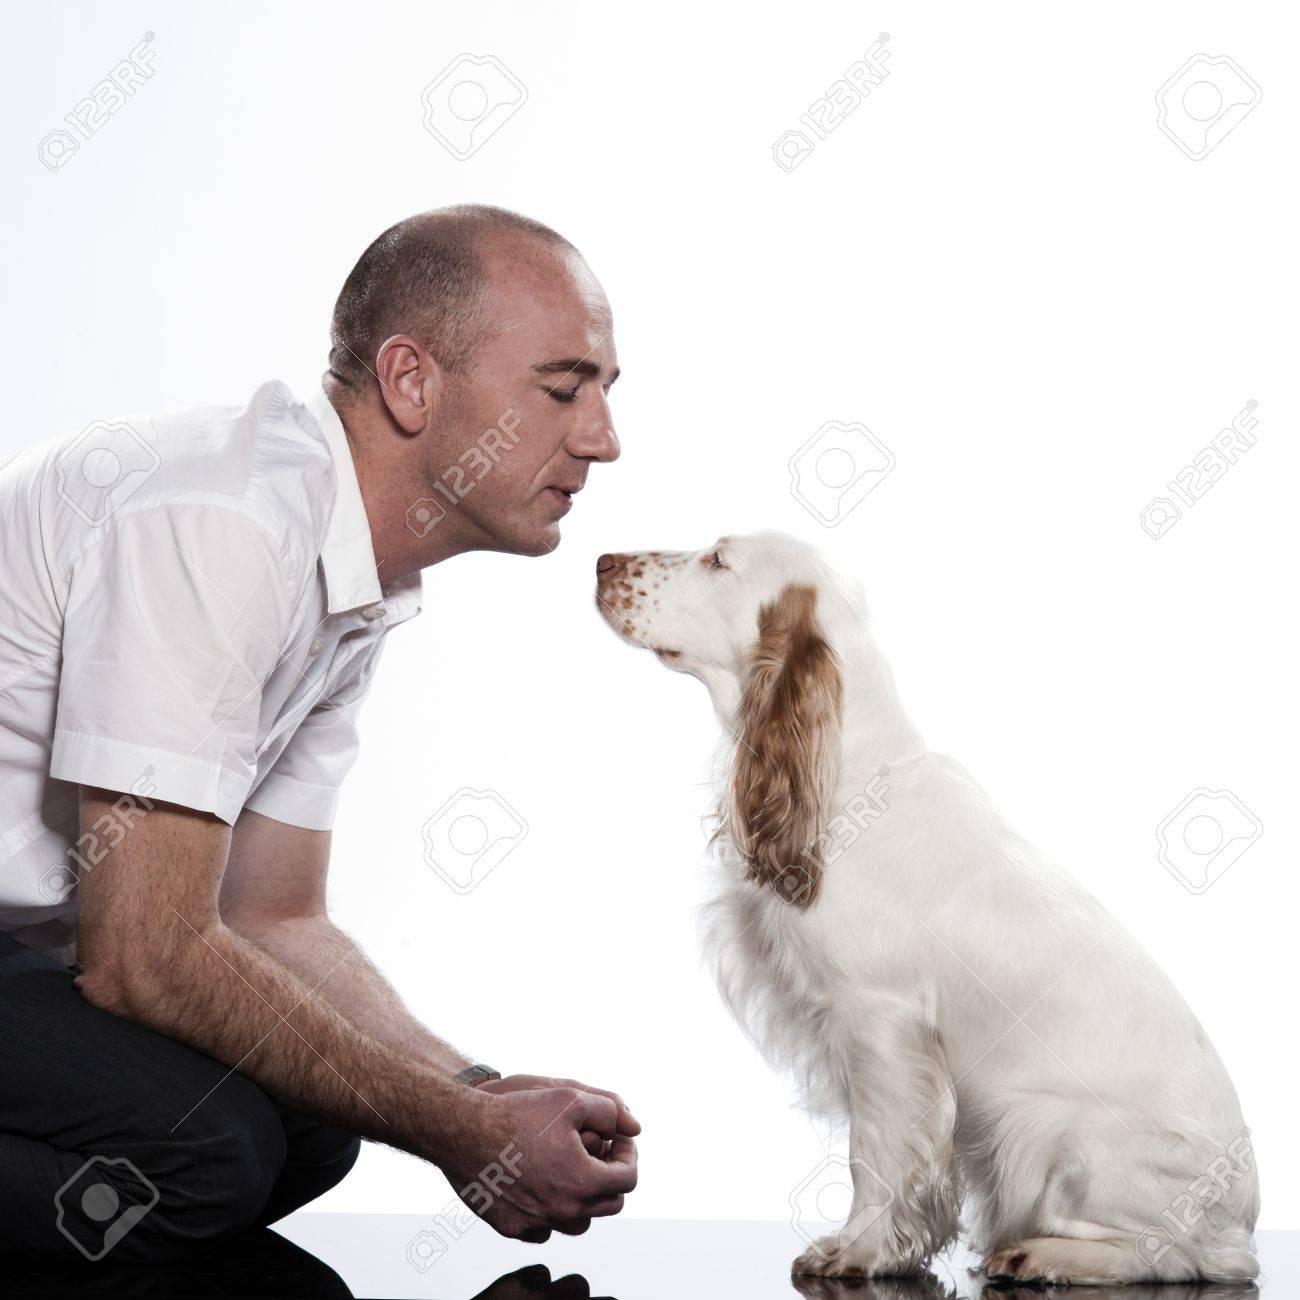 red English Cocker Spaniel and his master on studio white background Stock Photo - 11766476